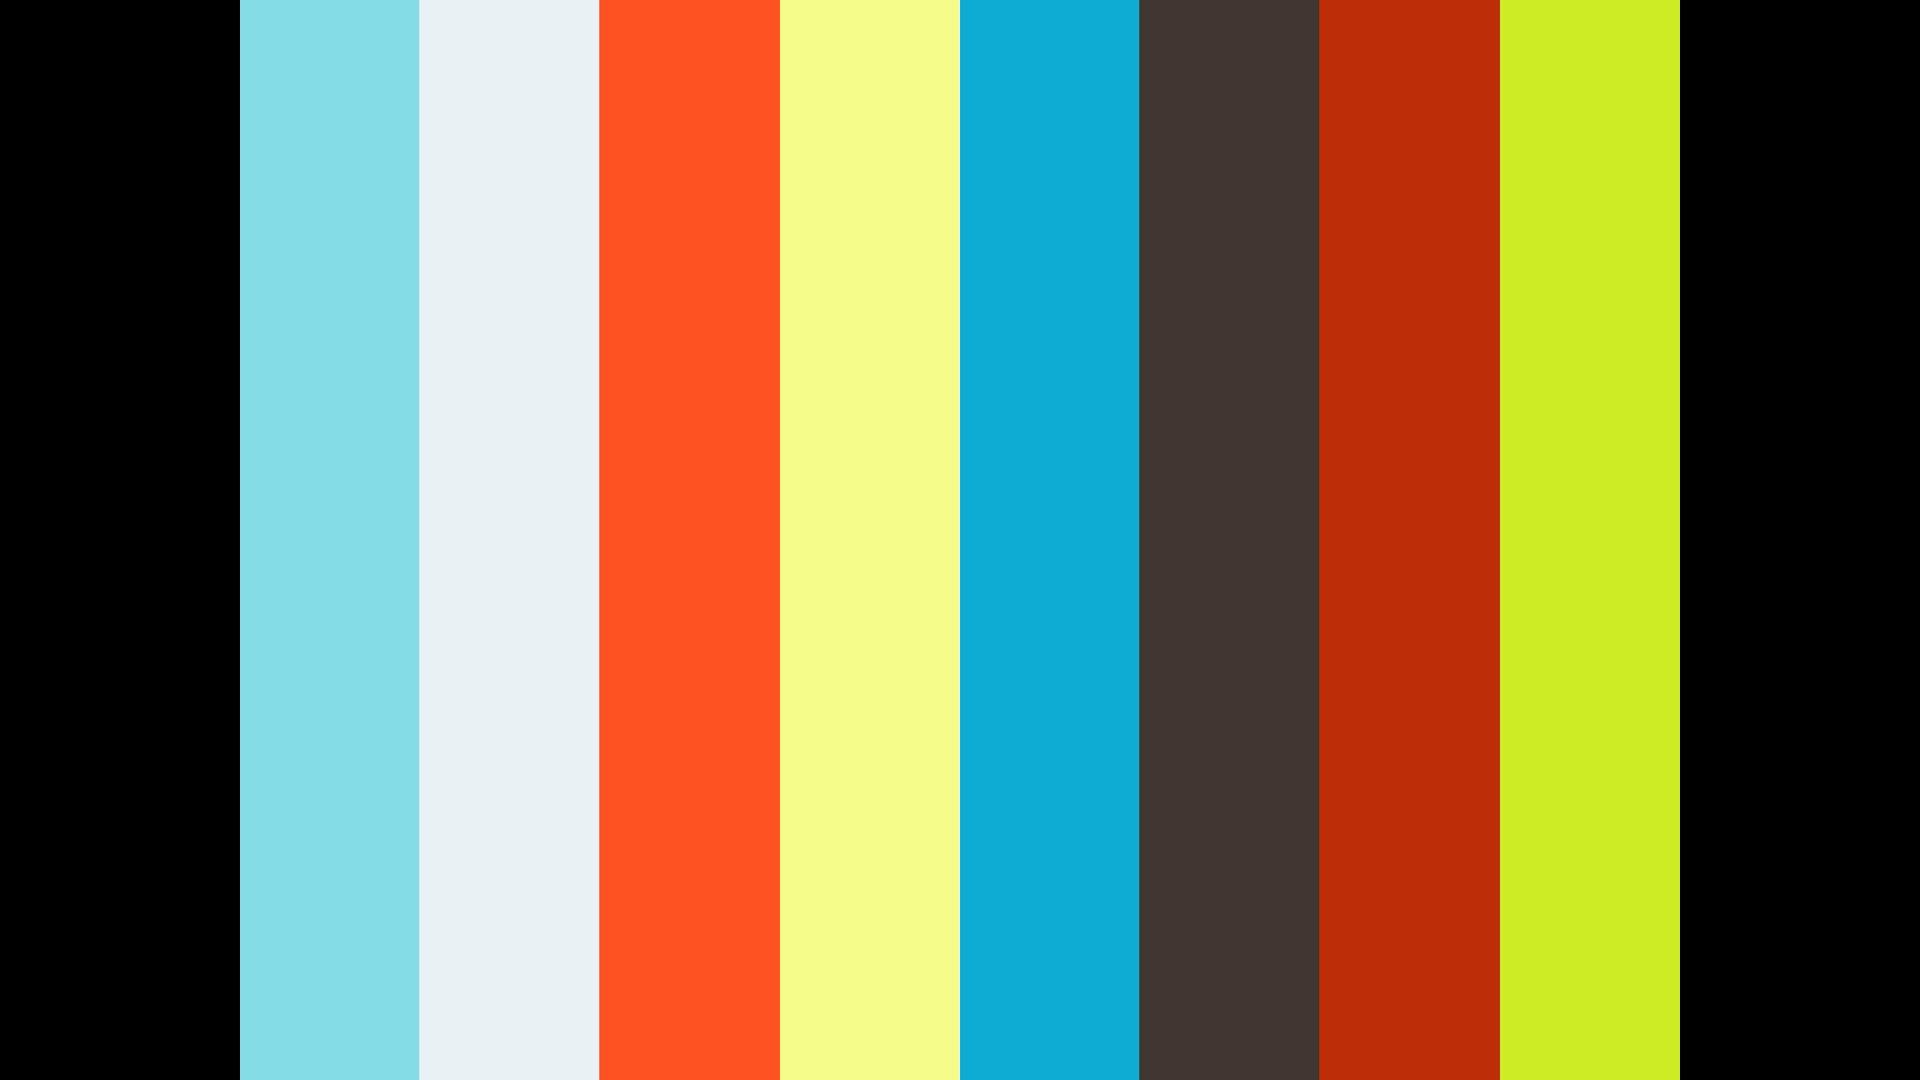 3.2 Symbol Explorer - Filters